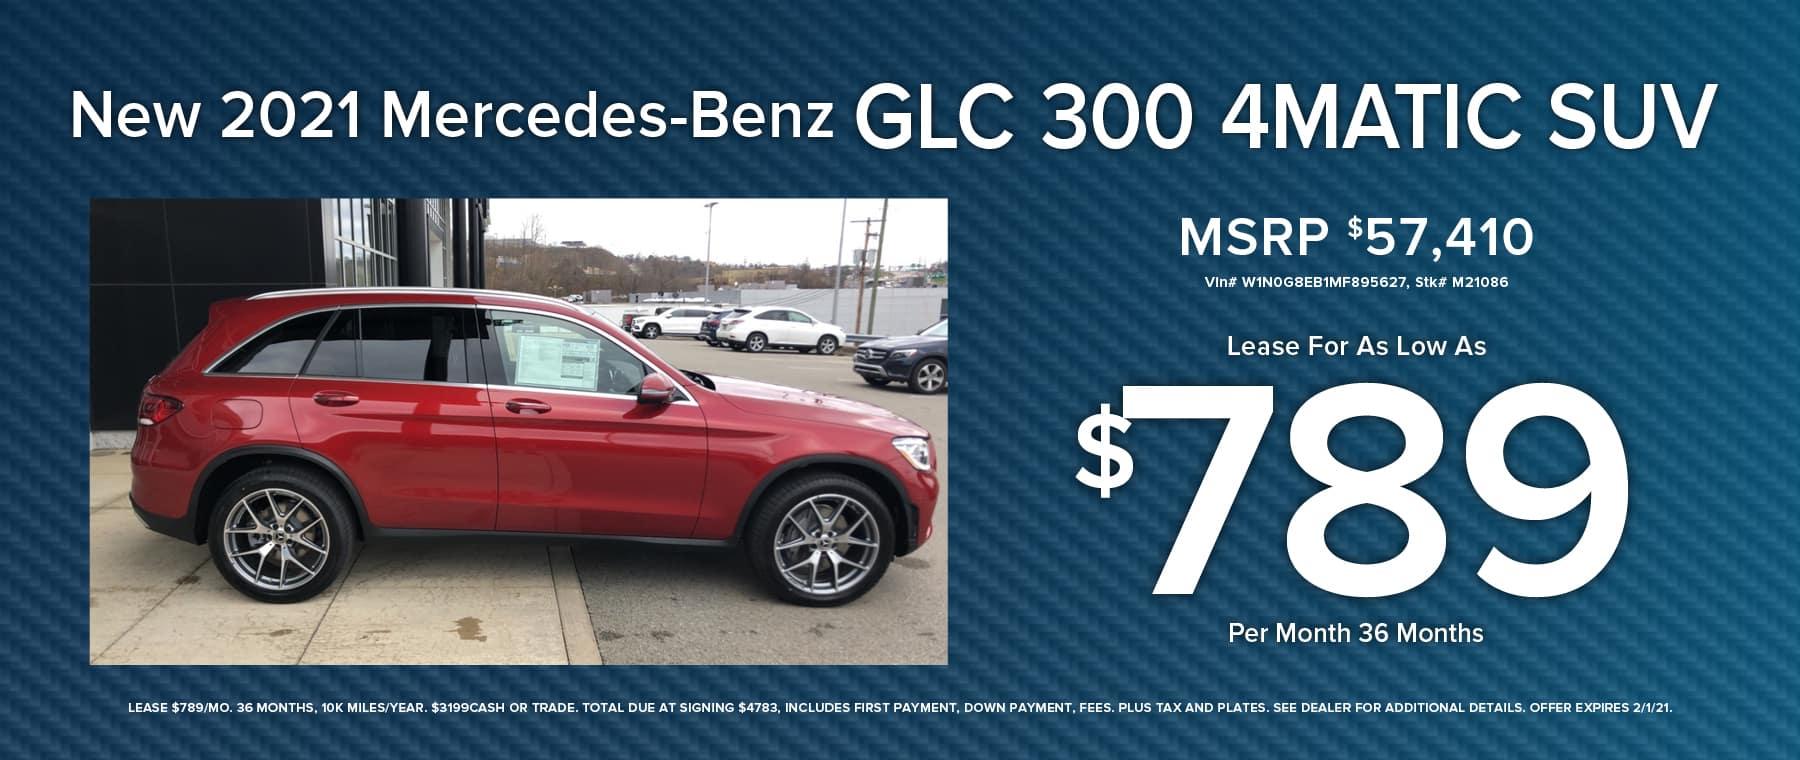 MERCEDES-BENZ GLC 300 4MATIC SUV